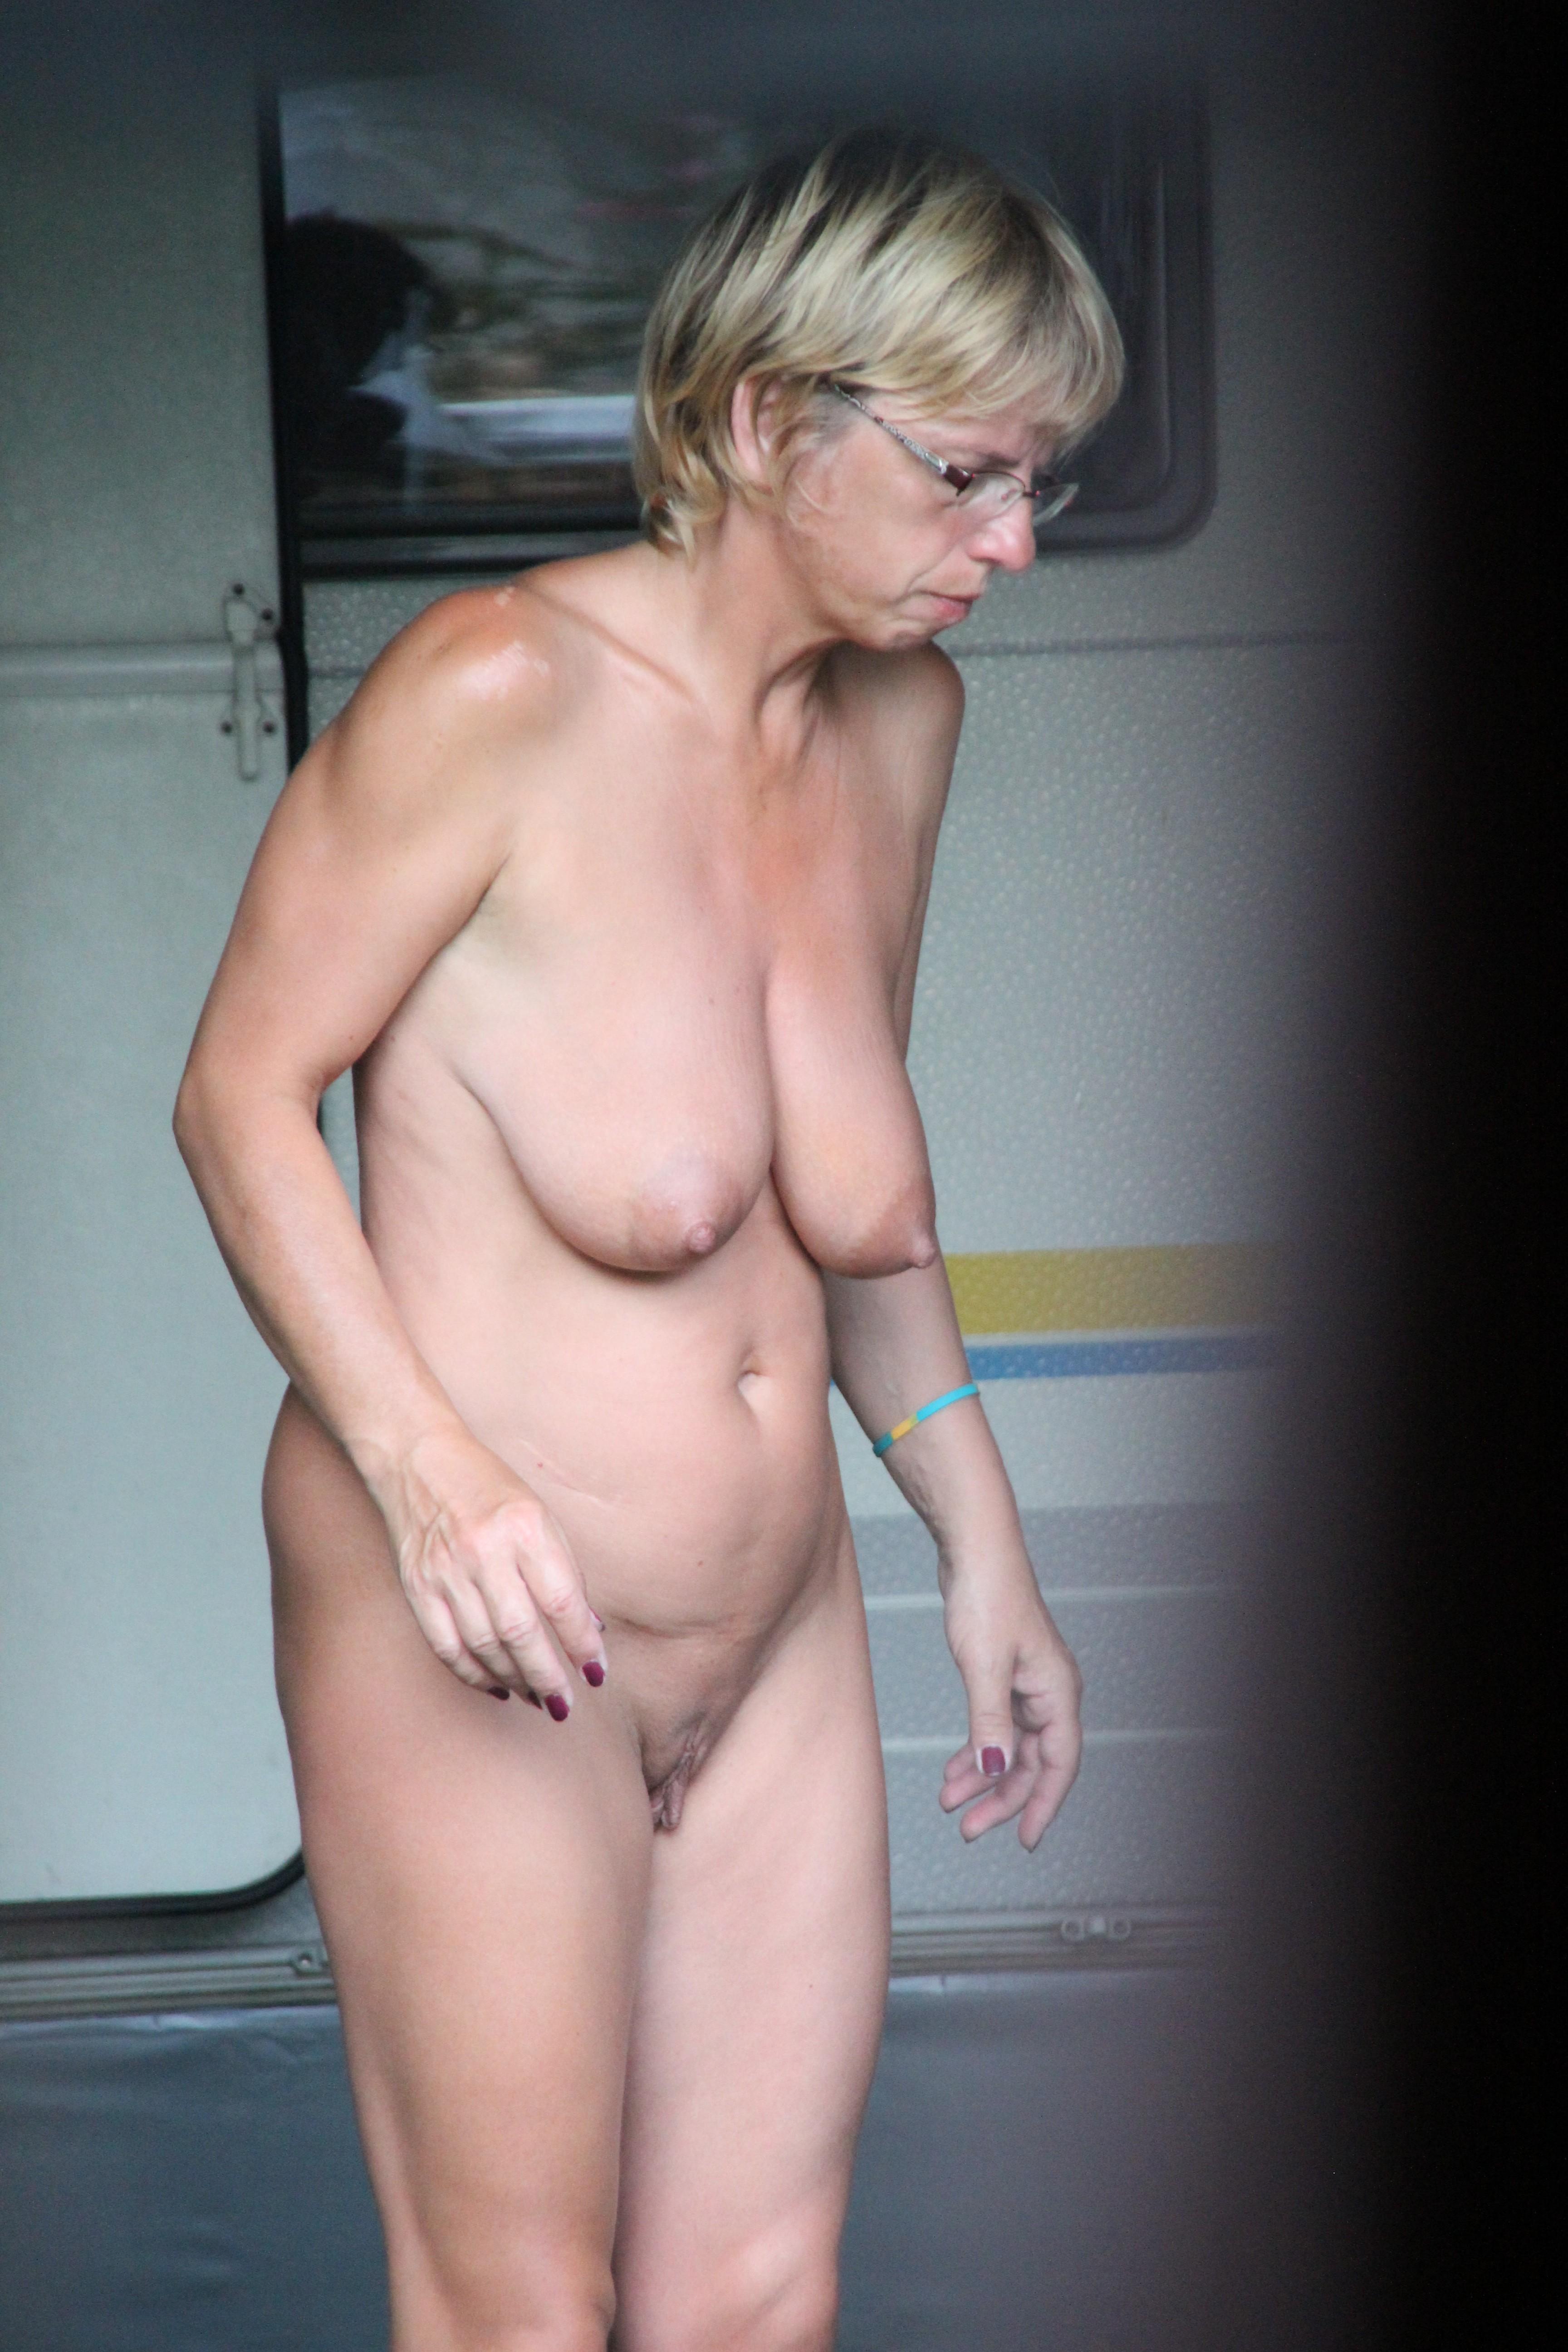 real amature nude granny pics